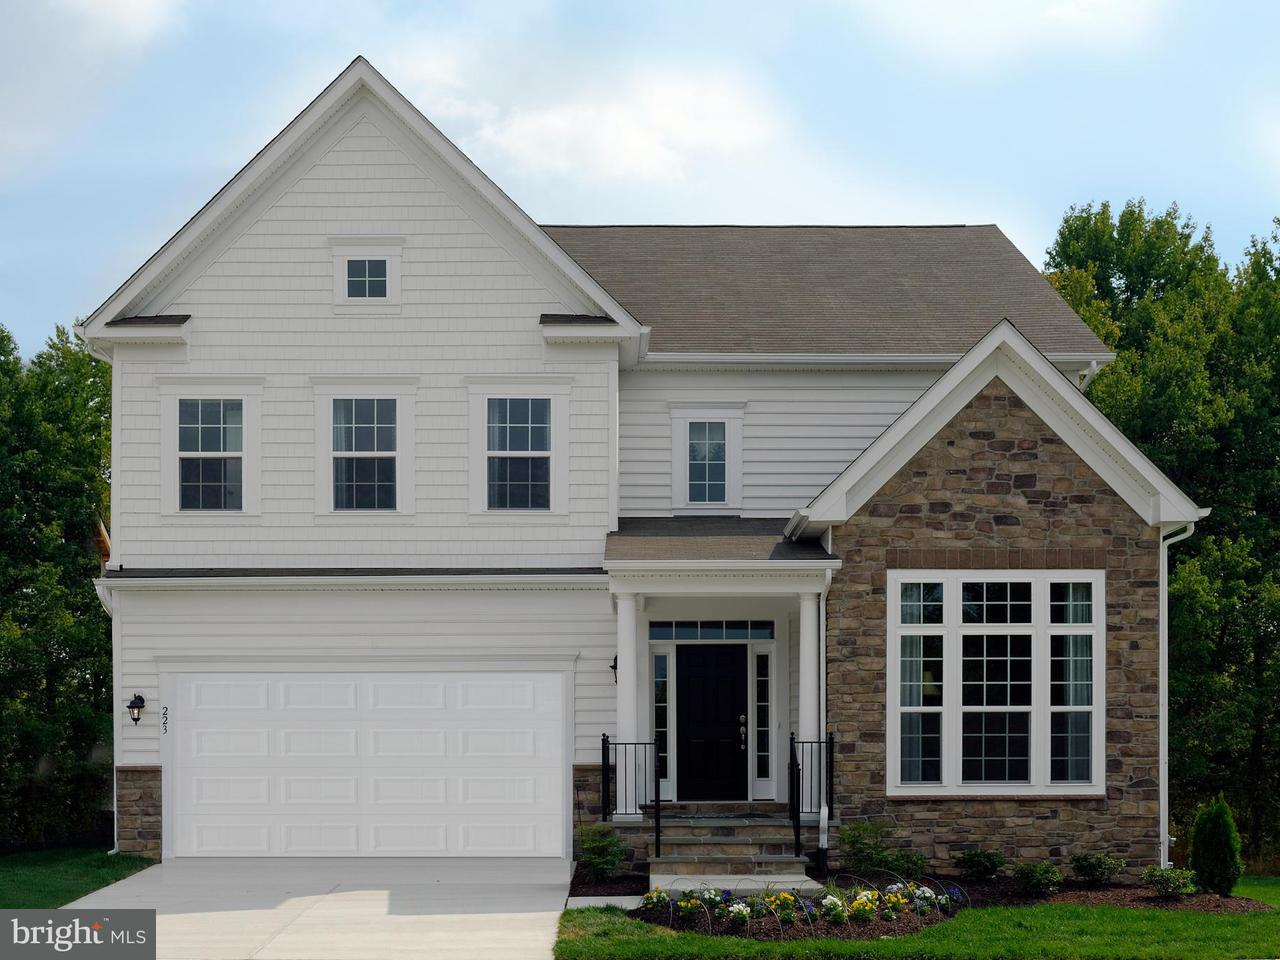 Single Family Home for Sale at 223 Saltgrass Drive 223 Saltgrass Drive Glen Burnie, Maryland 21060 United States